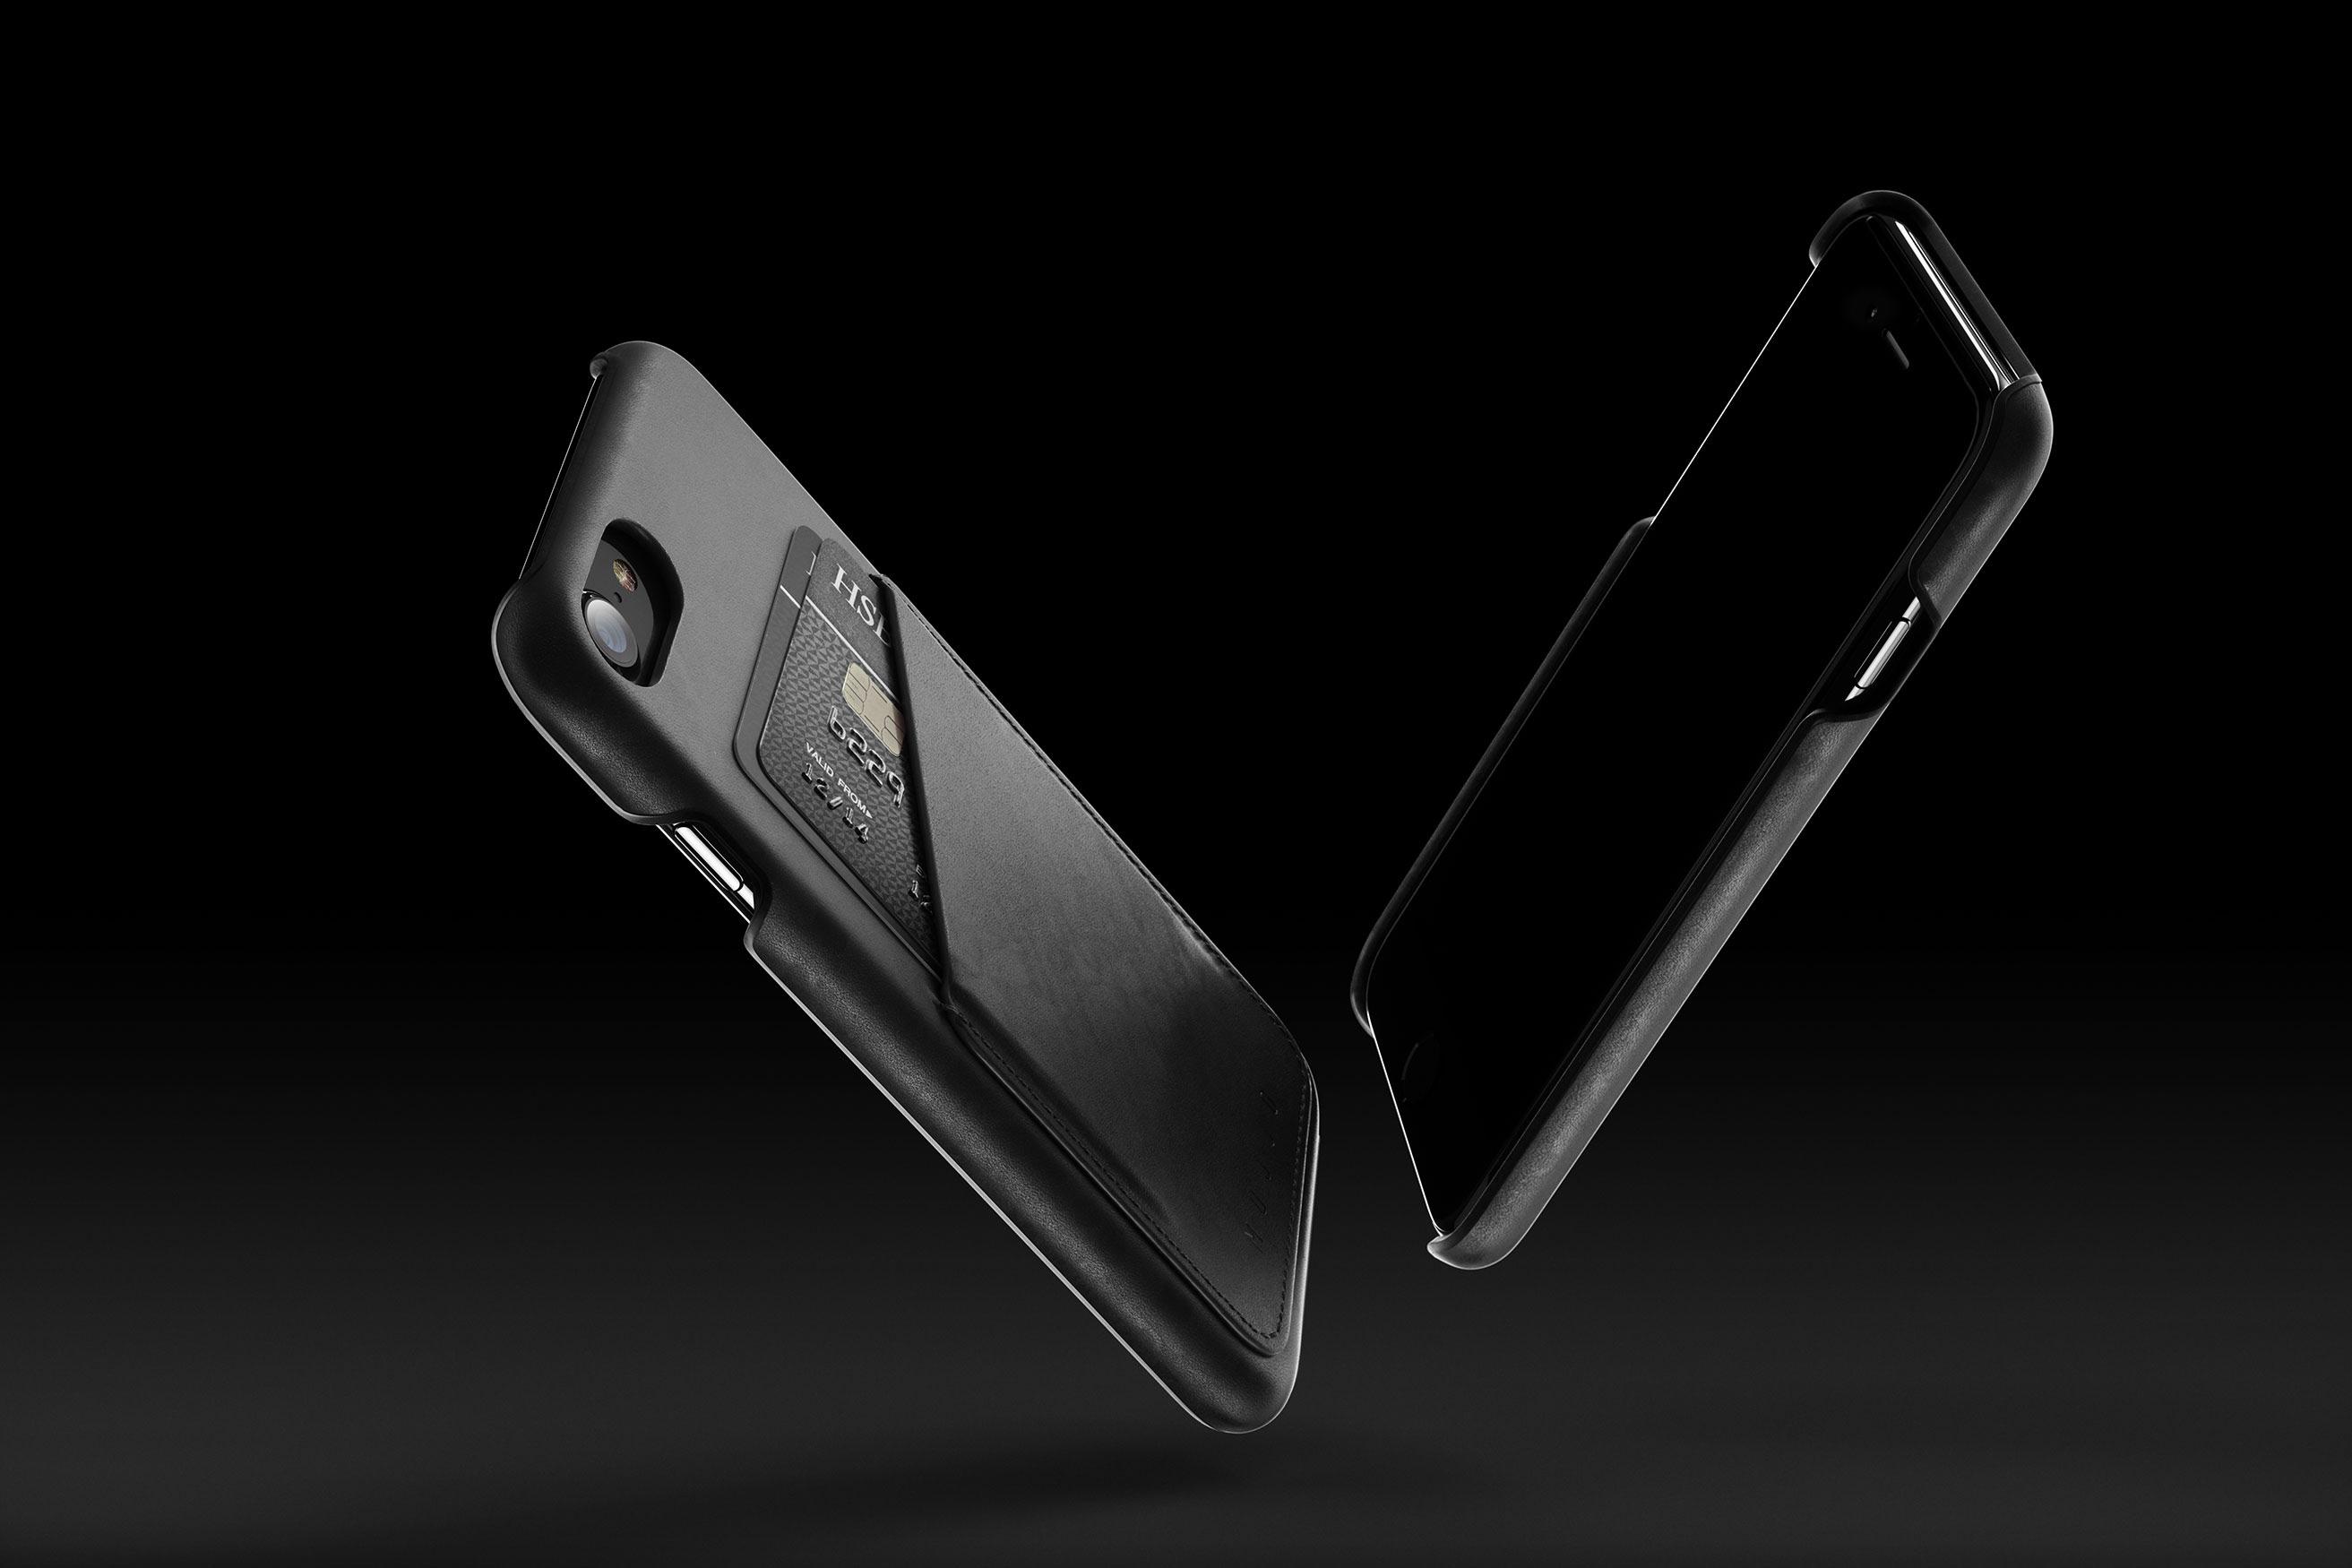 Mujjo iPhone 7